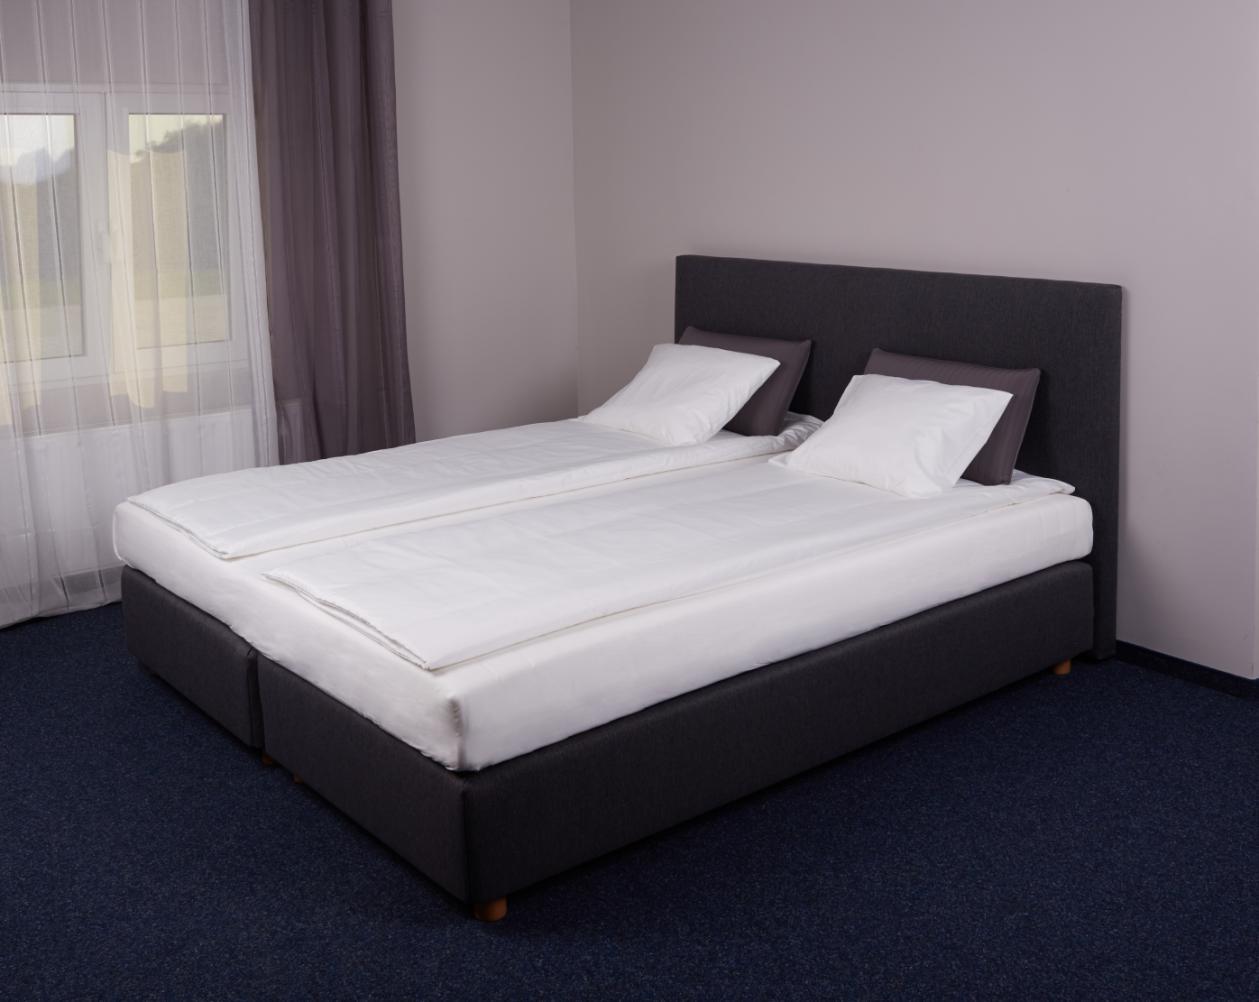 łóżko.jpg